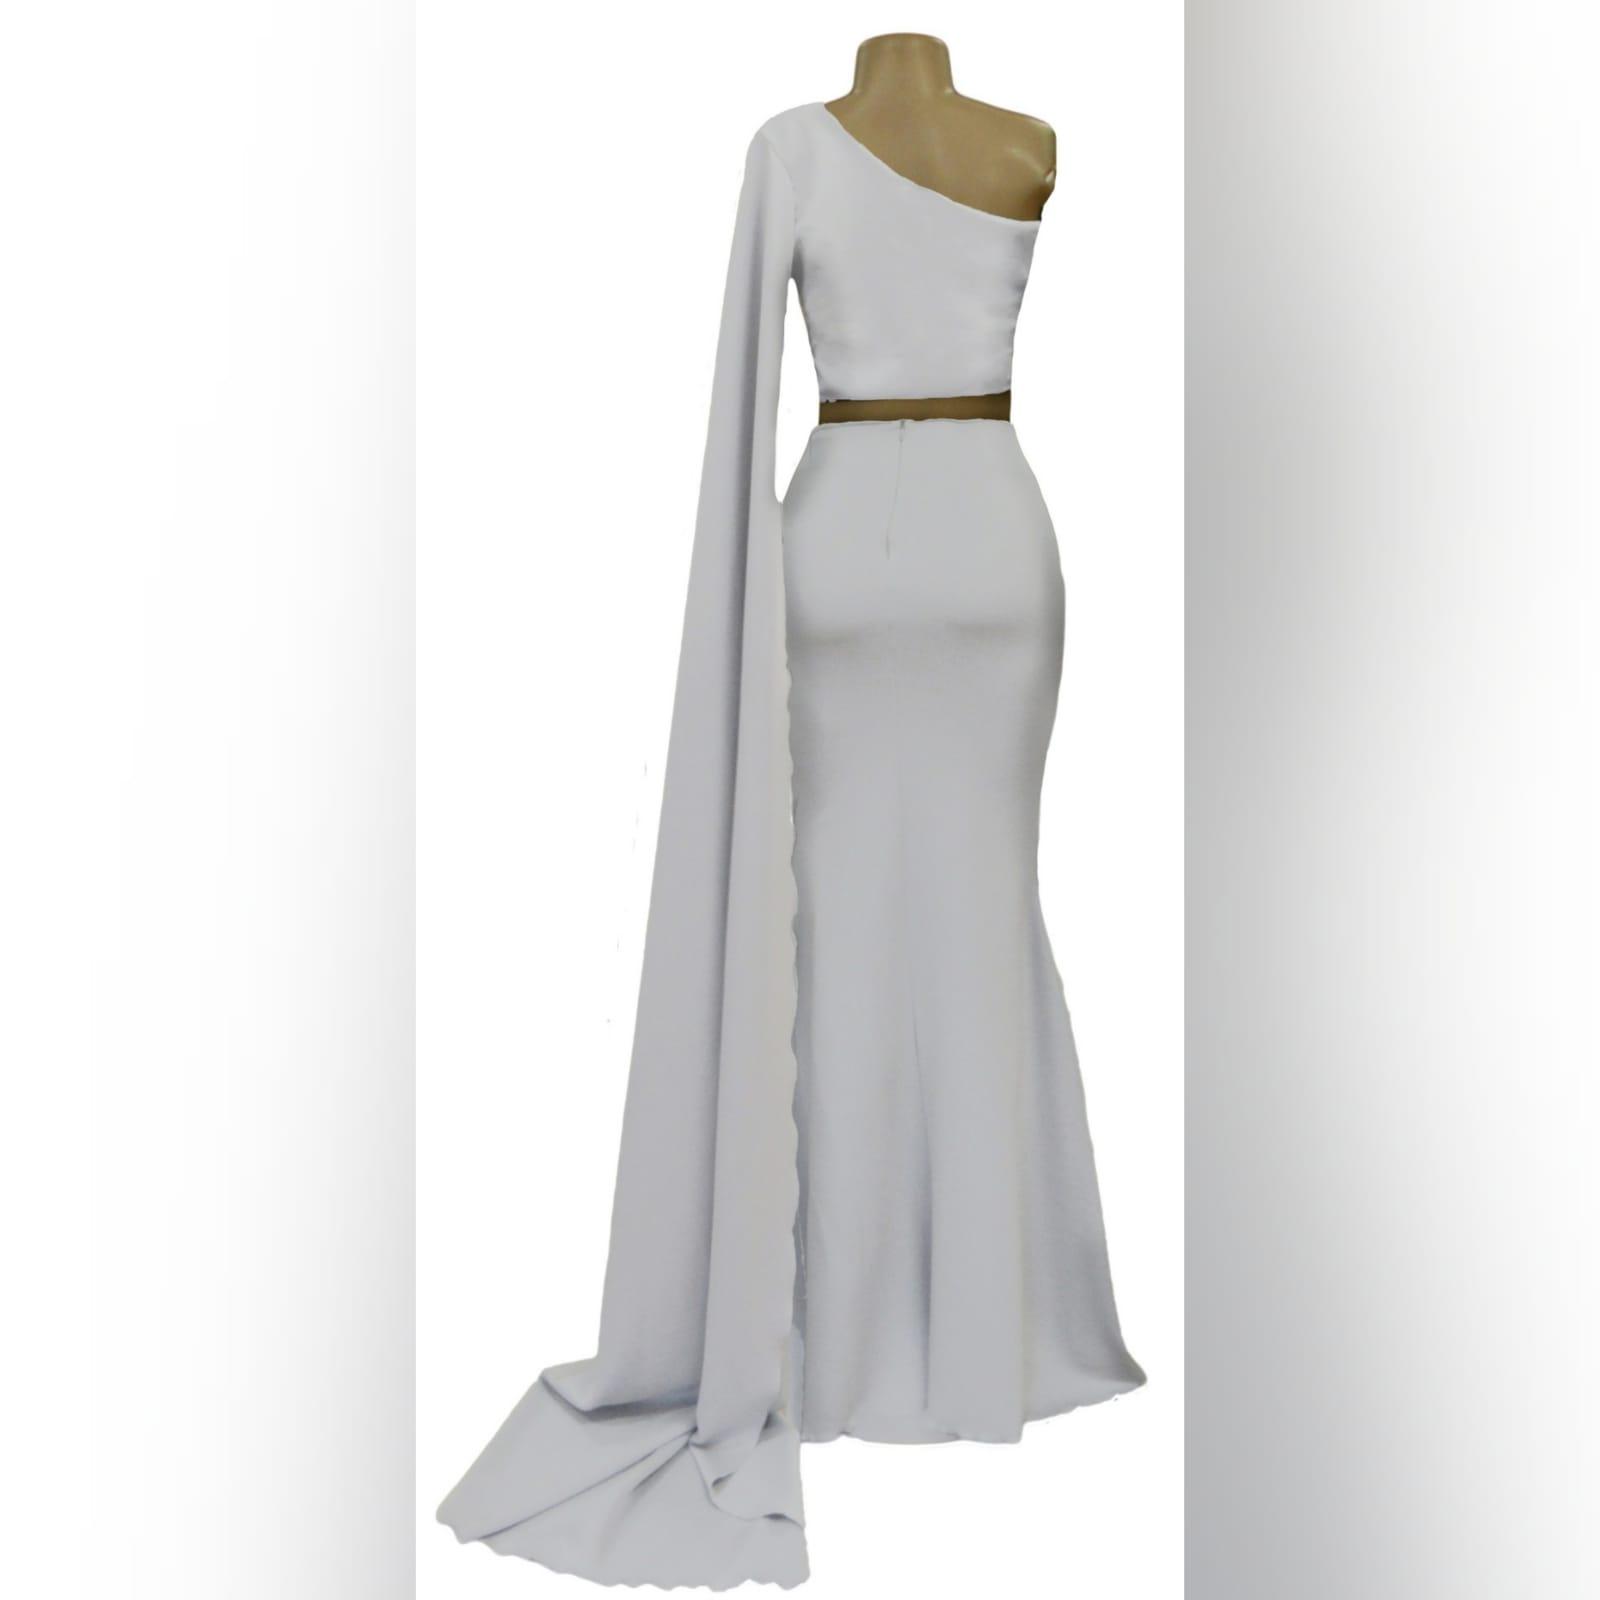 Pale grey 2 piece mermaid prom dress 3 pale grey 2 piece mermaid prom dress. Fitted crop top with wide single sleeve creating a train. Mermaid skirt with a little train.